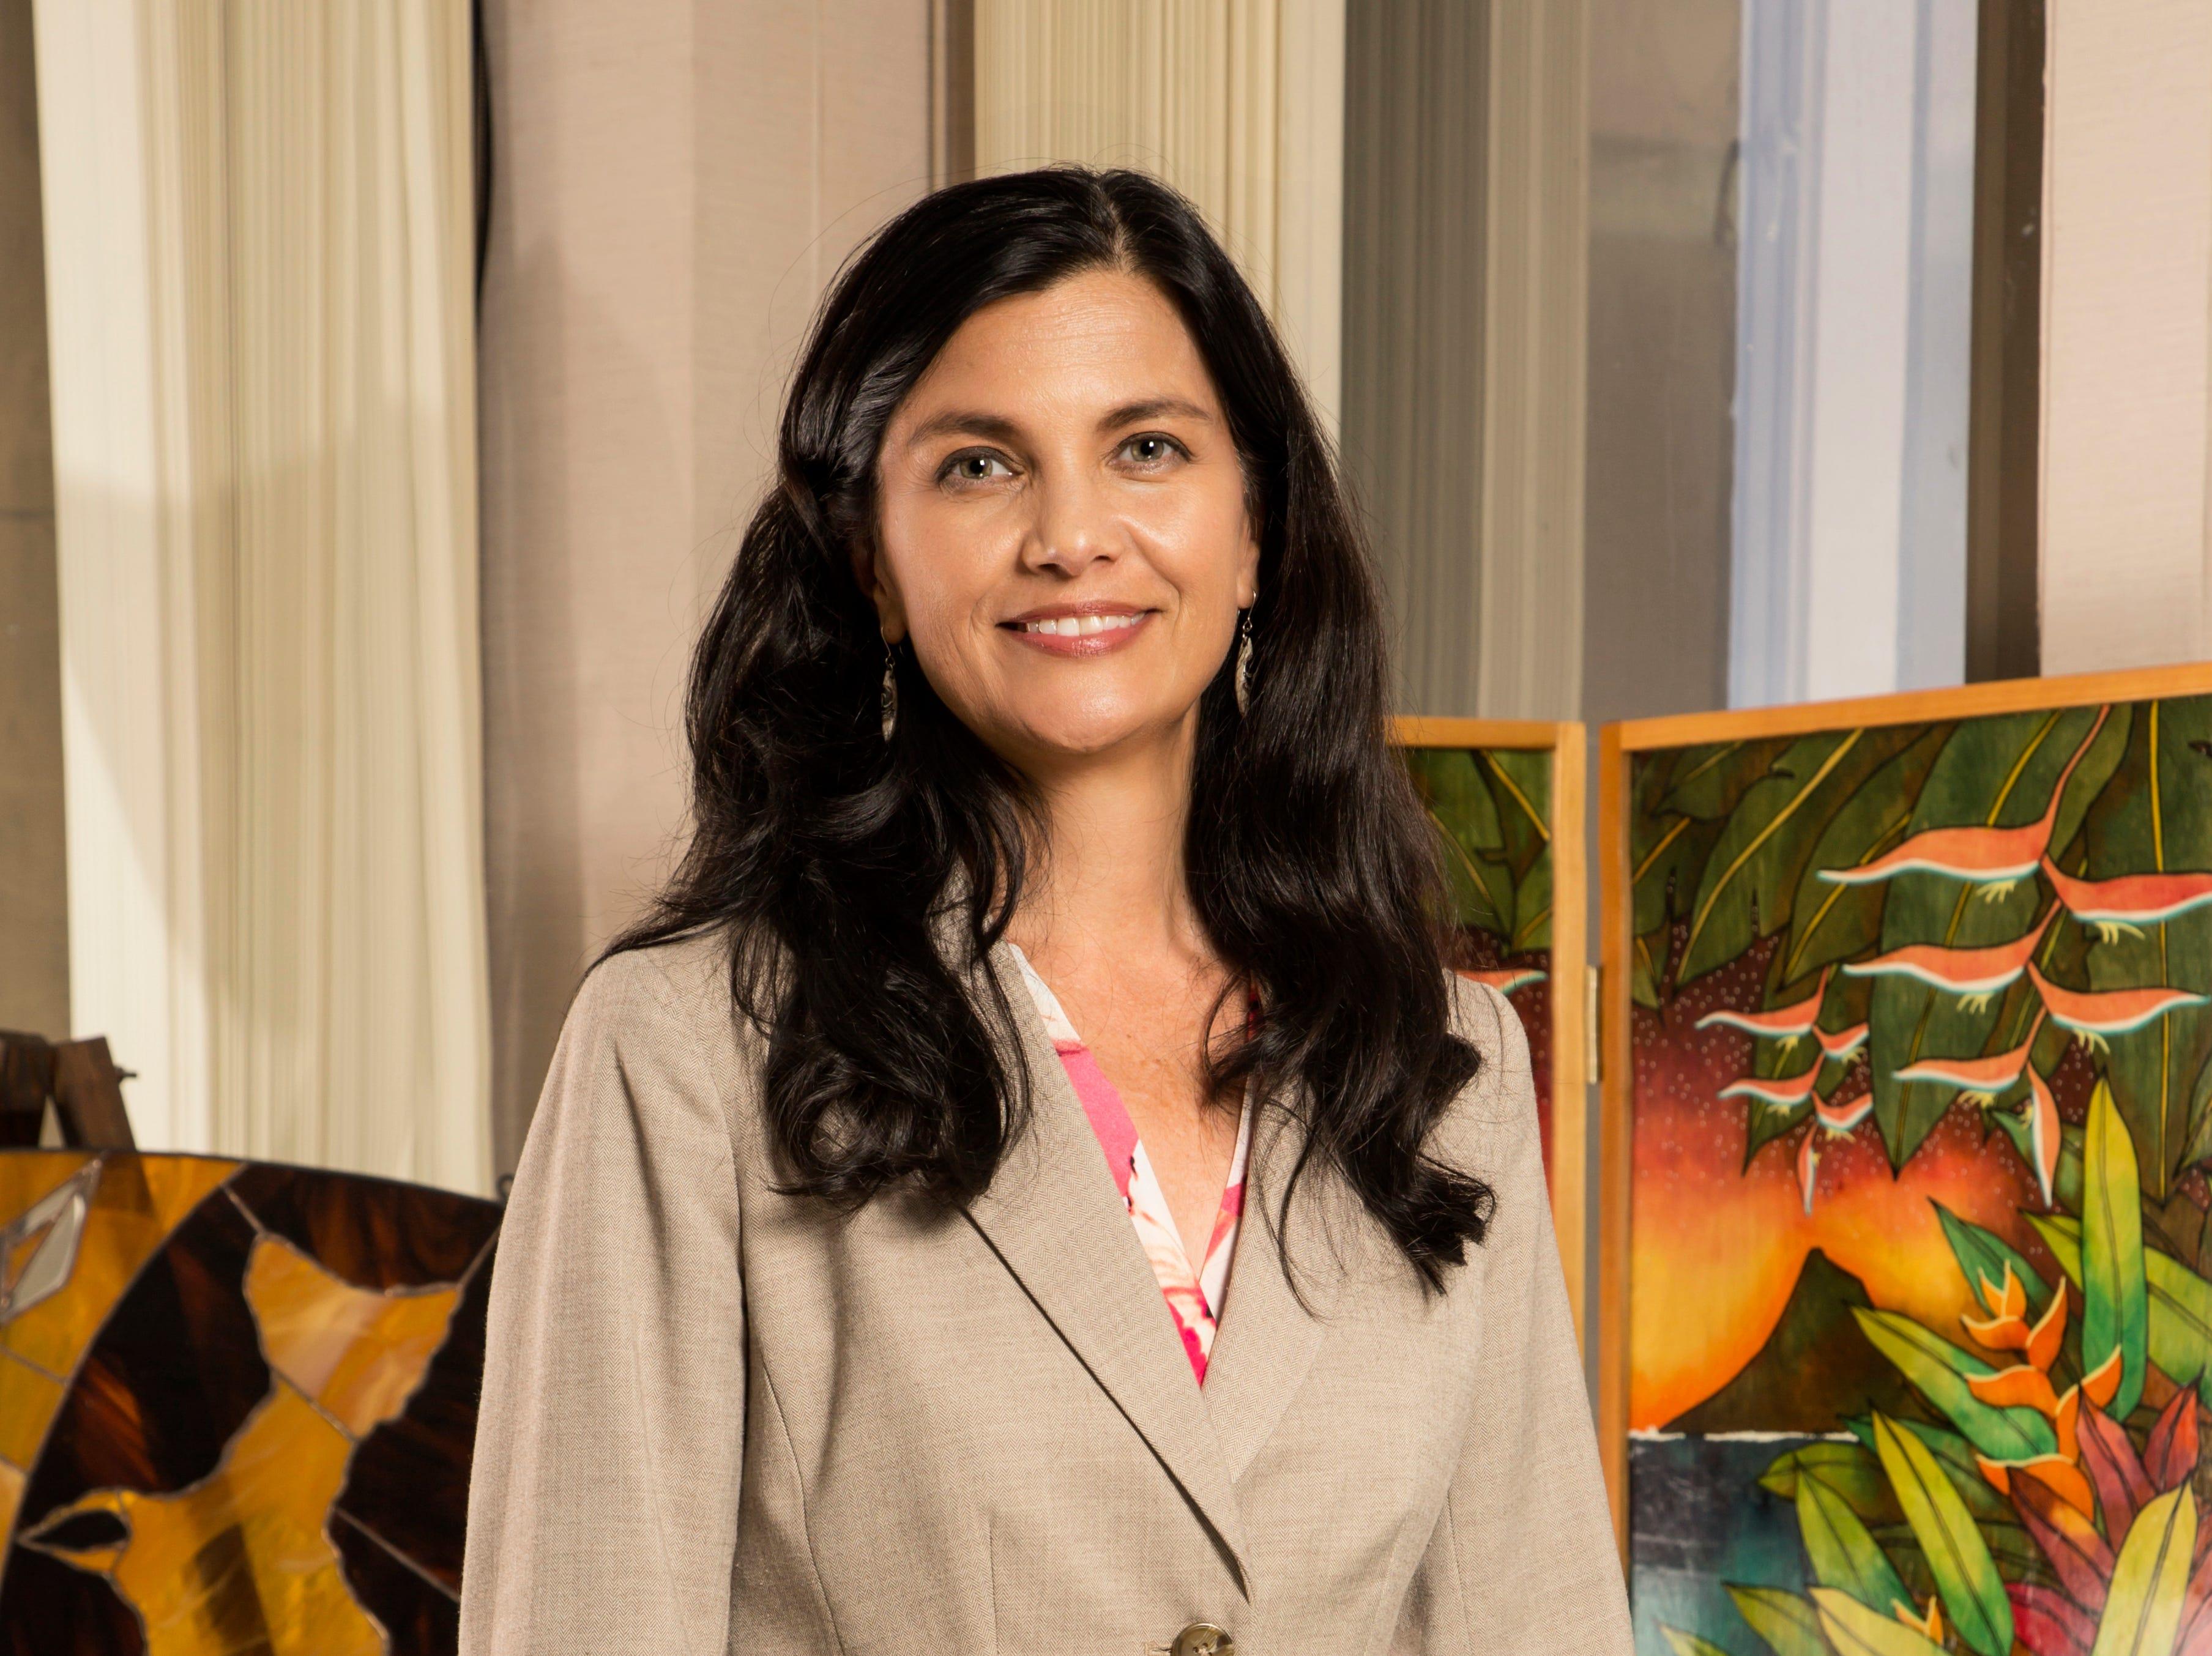 Vice Speaker Therese Terlaje (D)